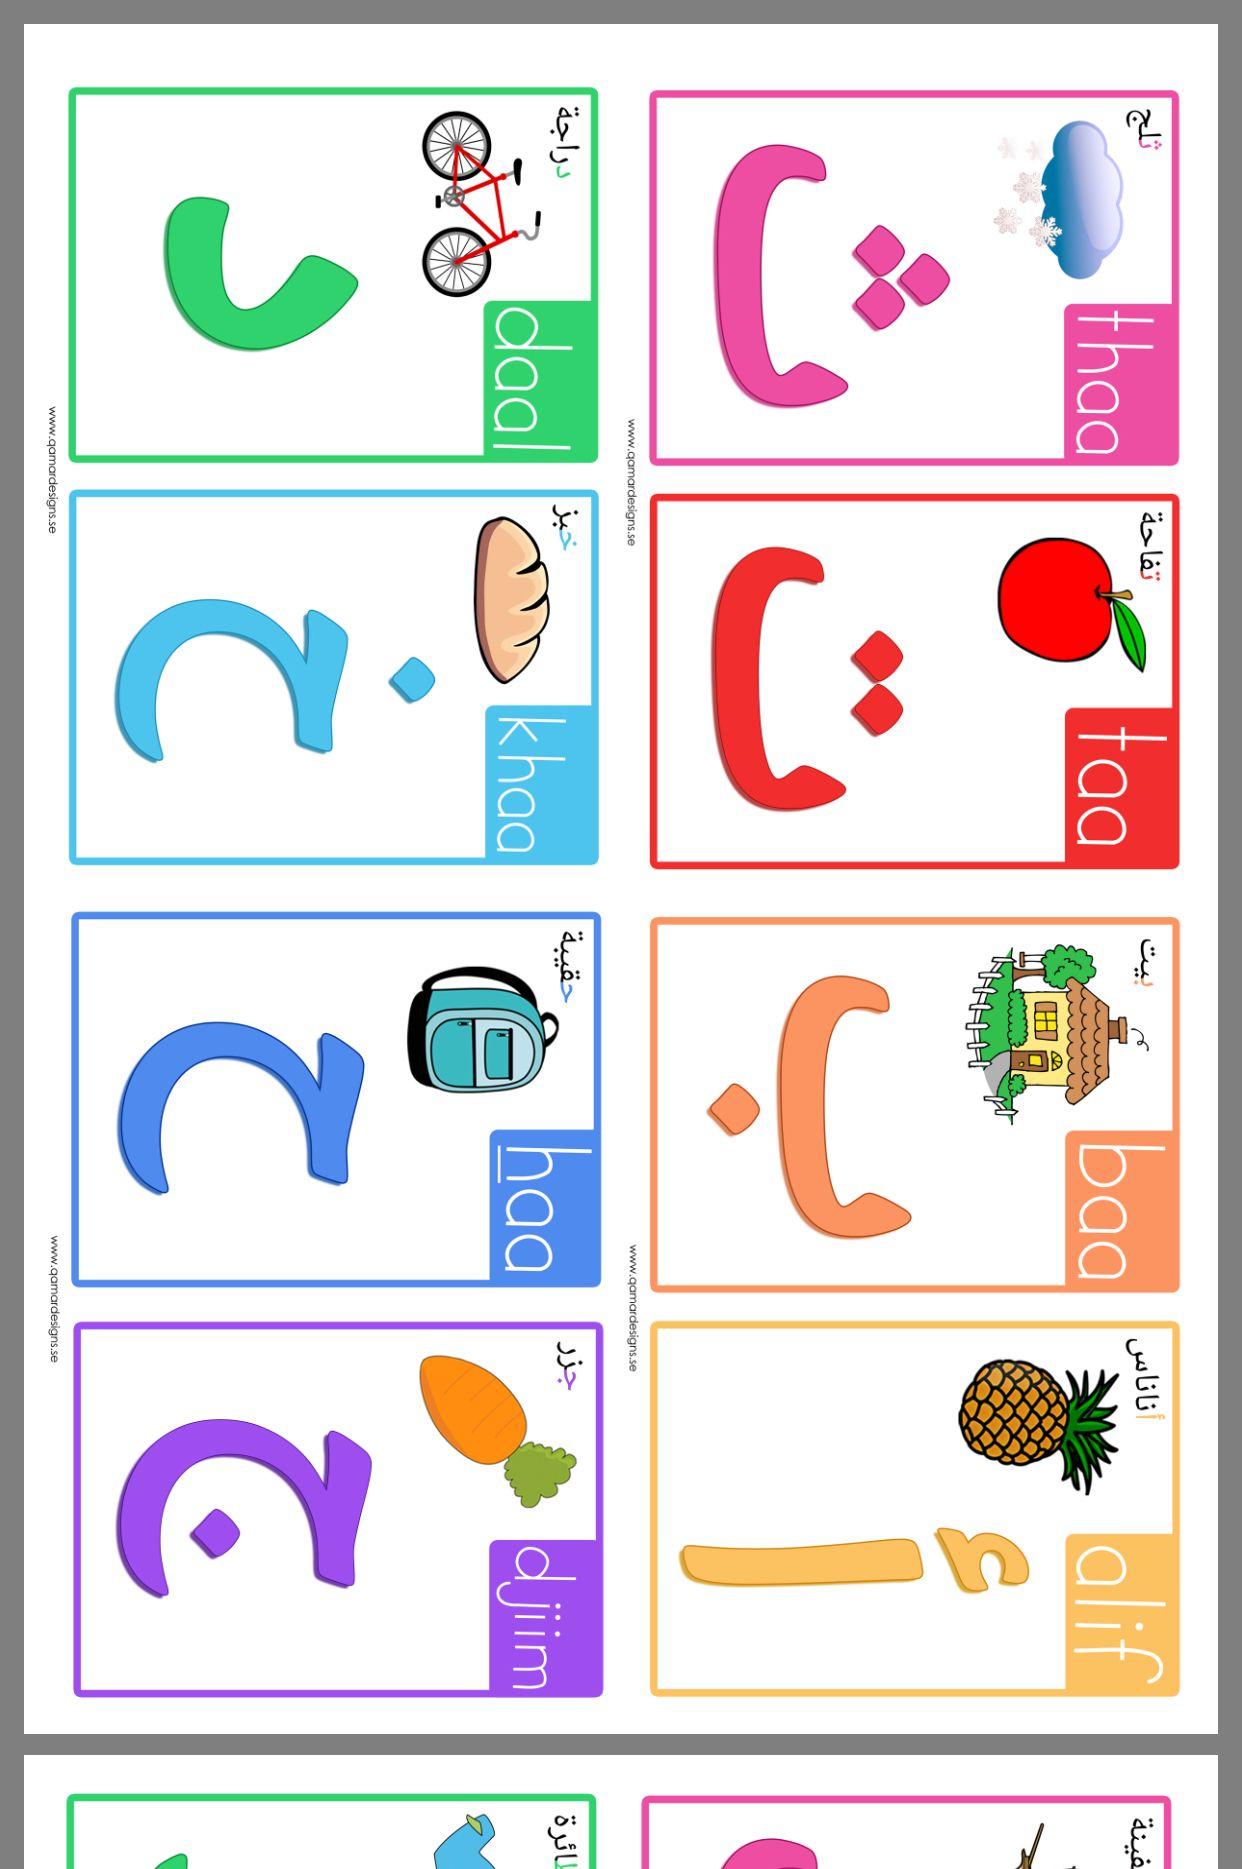 Pin Oleh Fa H Zayed Di Flashcards